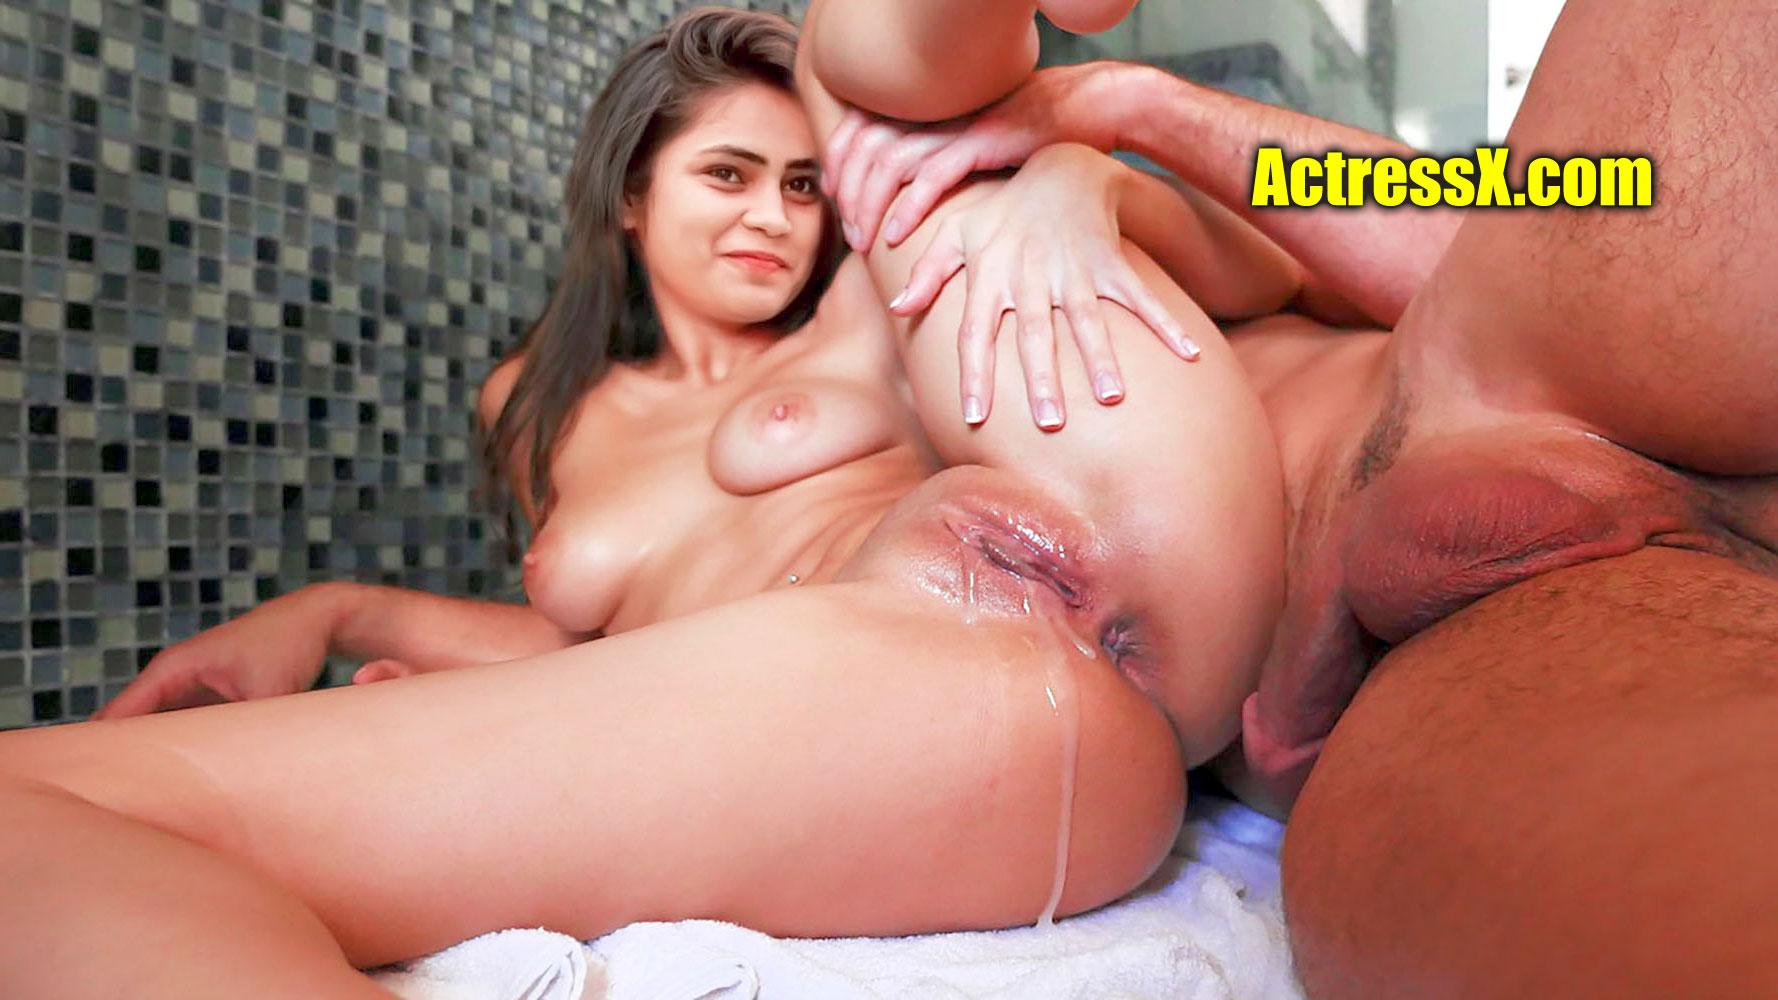 Sowmya Dhanavath nude pussy cumshot after hardcore sex